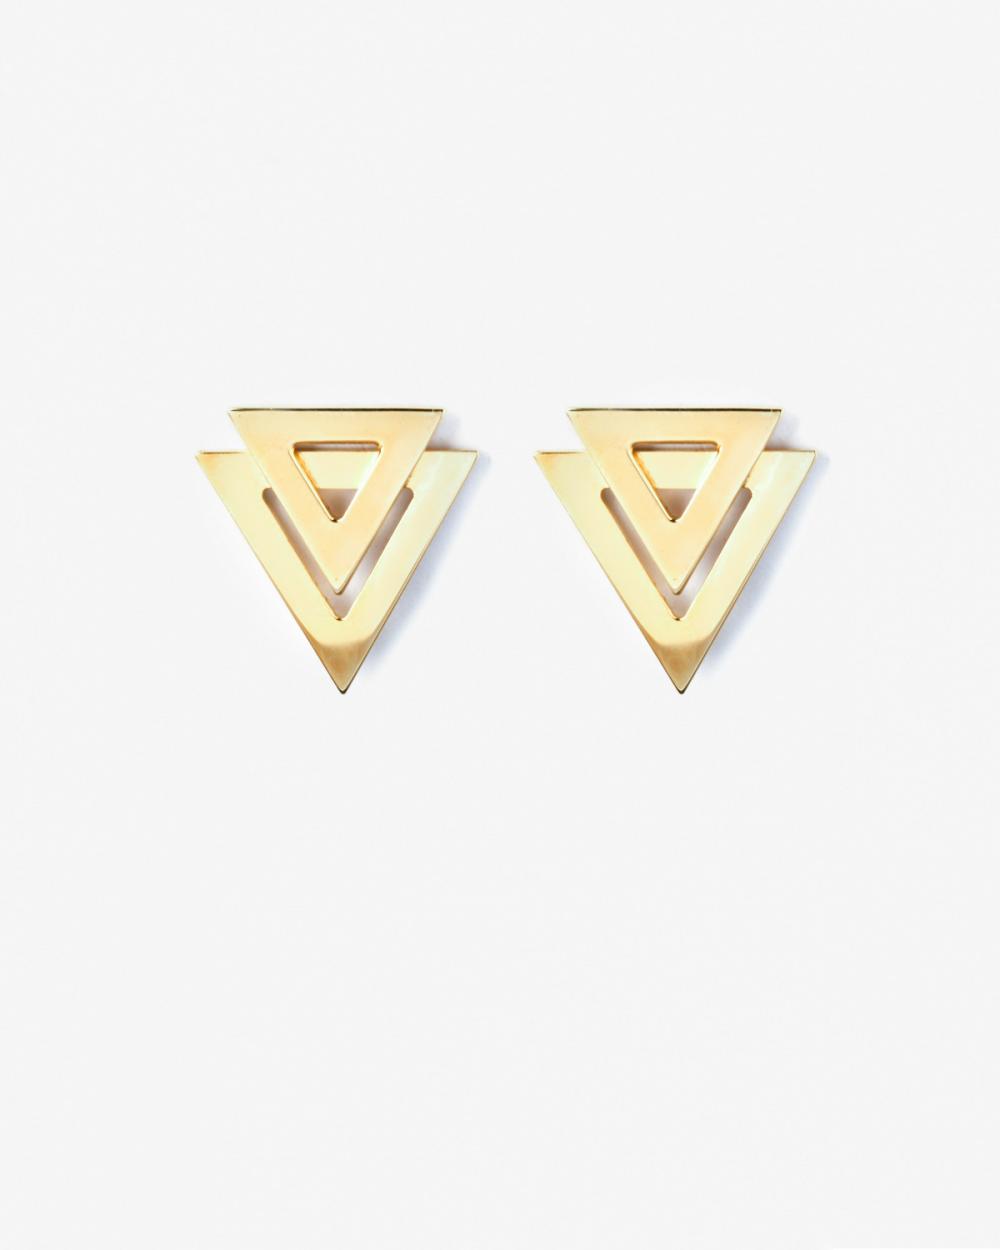 Earrings YELLOW GOLD DOUBLE TRIANGLE BIG EARRINGS NOVE25